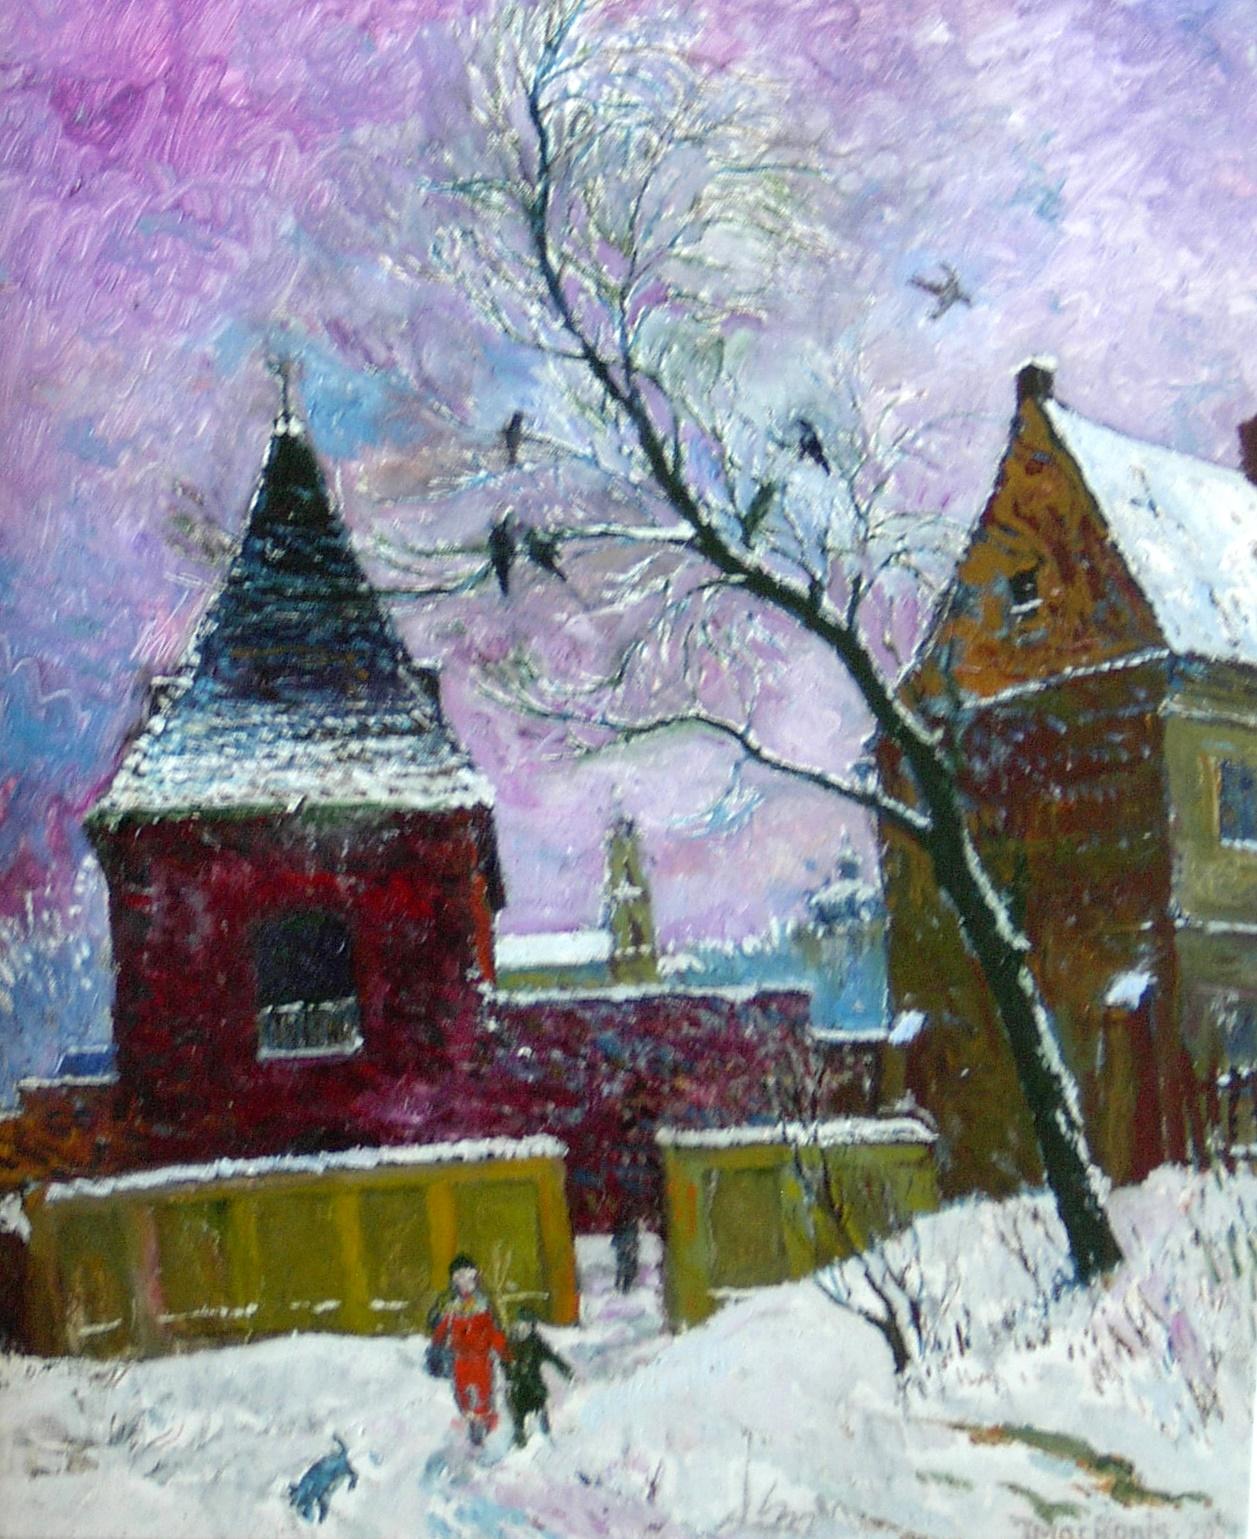 Vilniaus žiema a la Breugel, 2001, 60x50